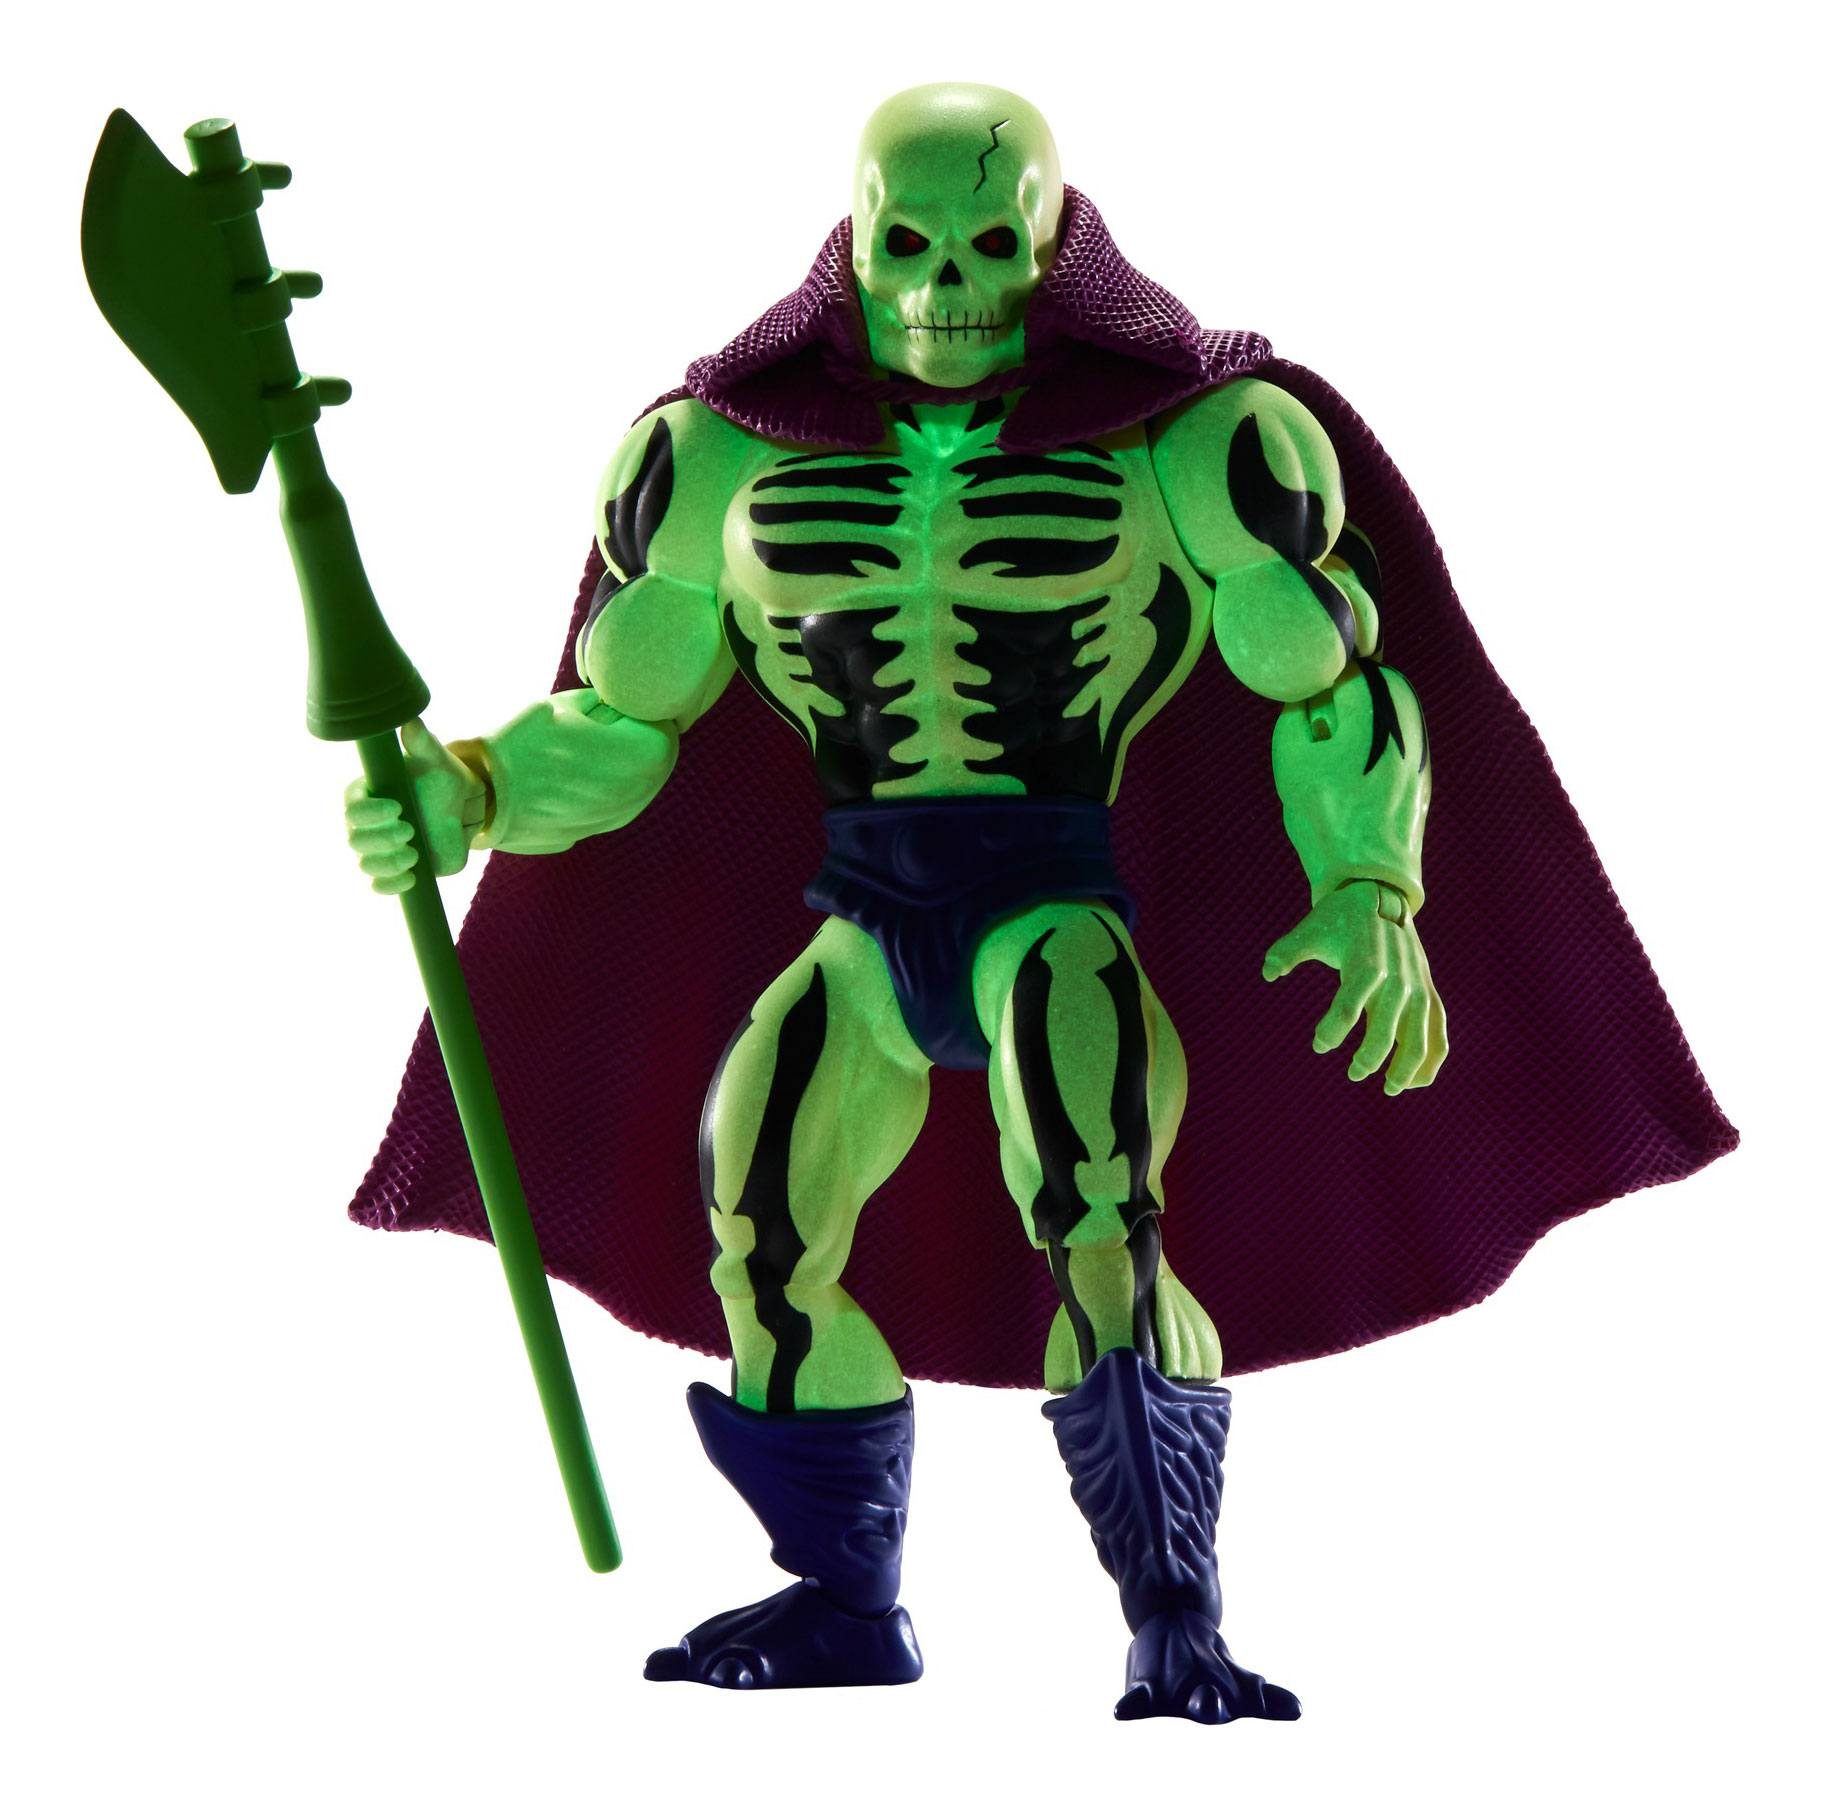 Masters of the Universe Origins Actionfigur 2020 Scare Glow 14 cm MATTGNN94 887961875393